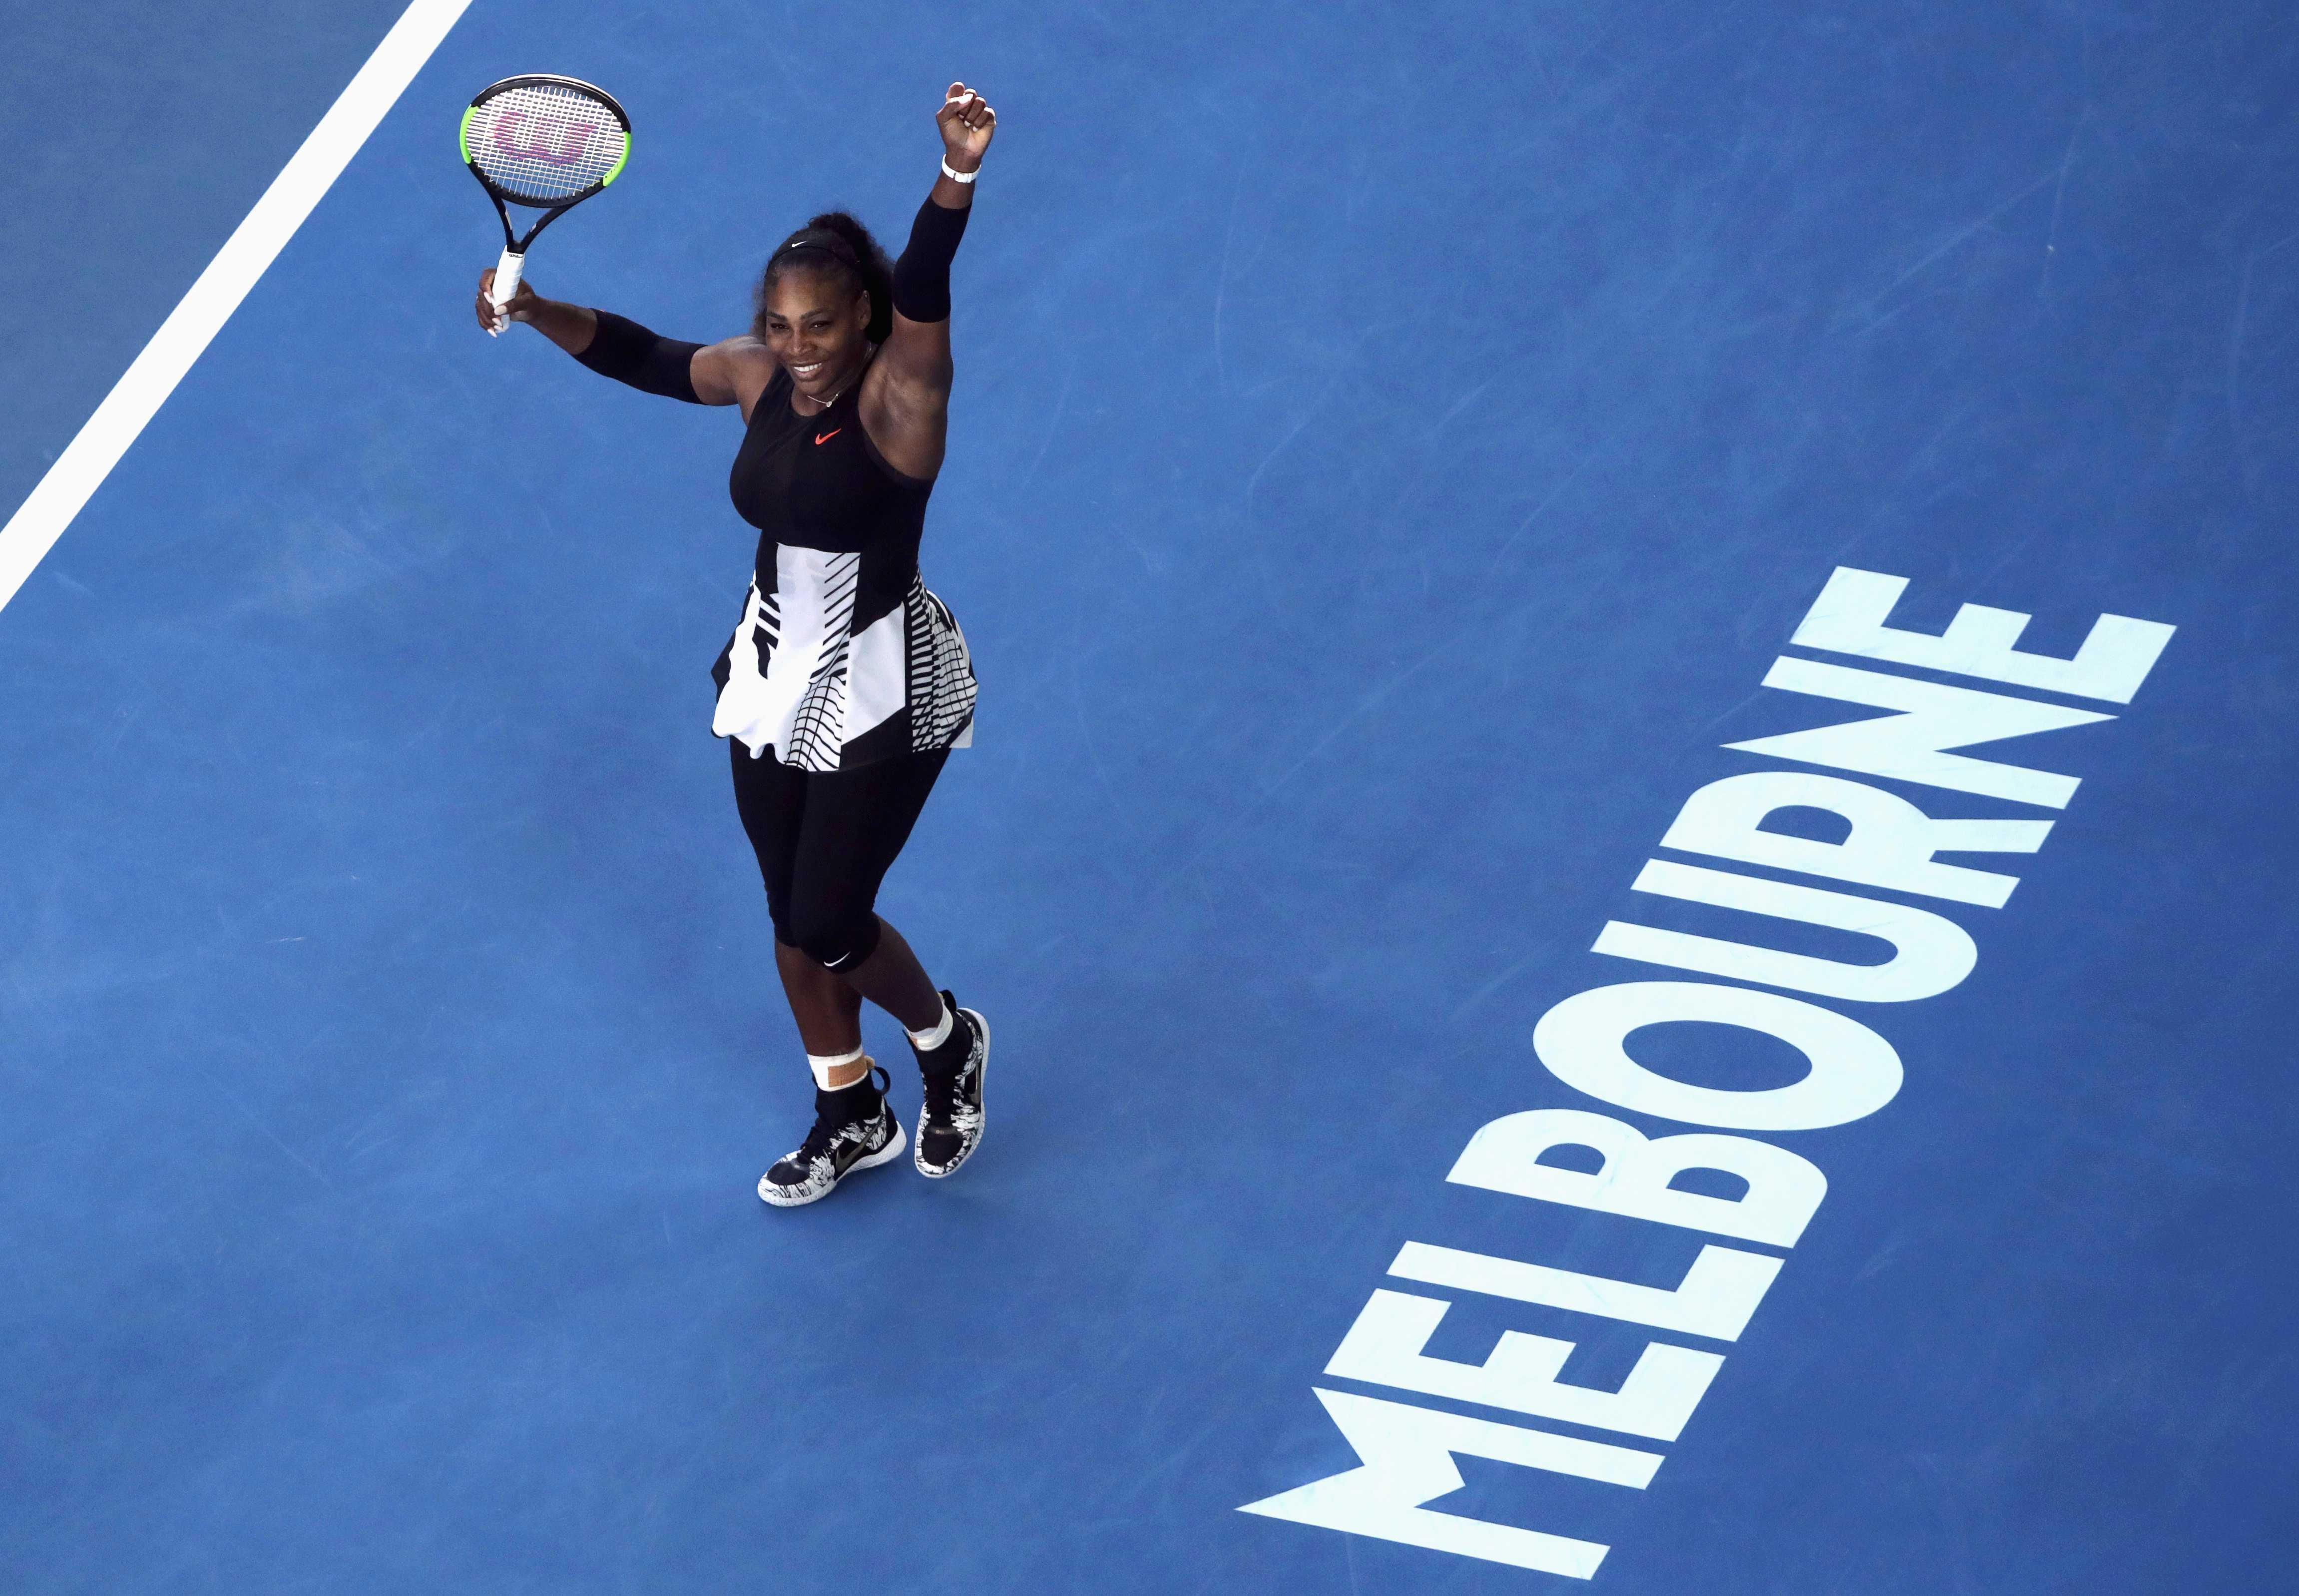 Tennis: Serena beats Lucic-Baroni, to meet sister Venus in final